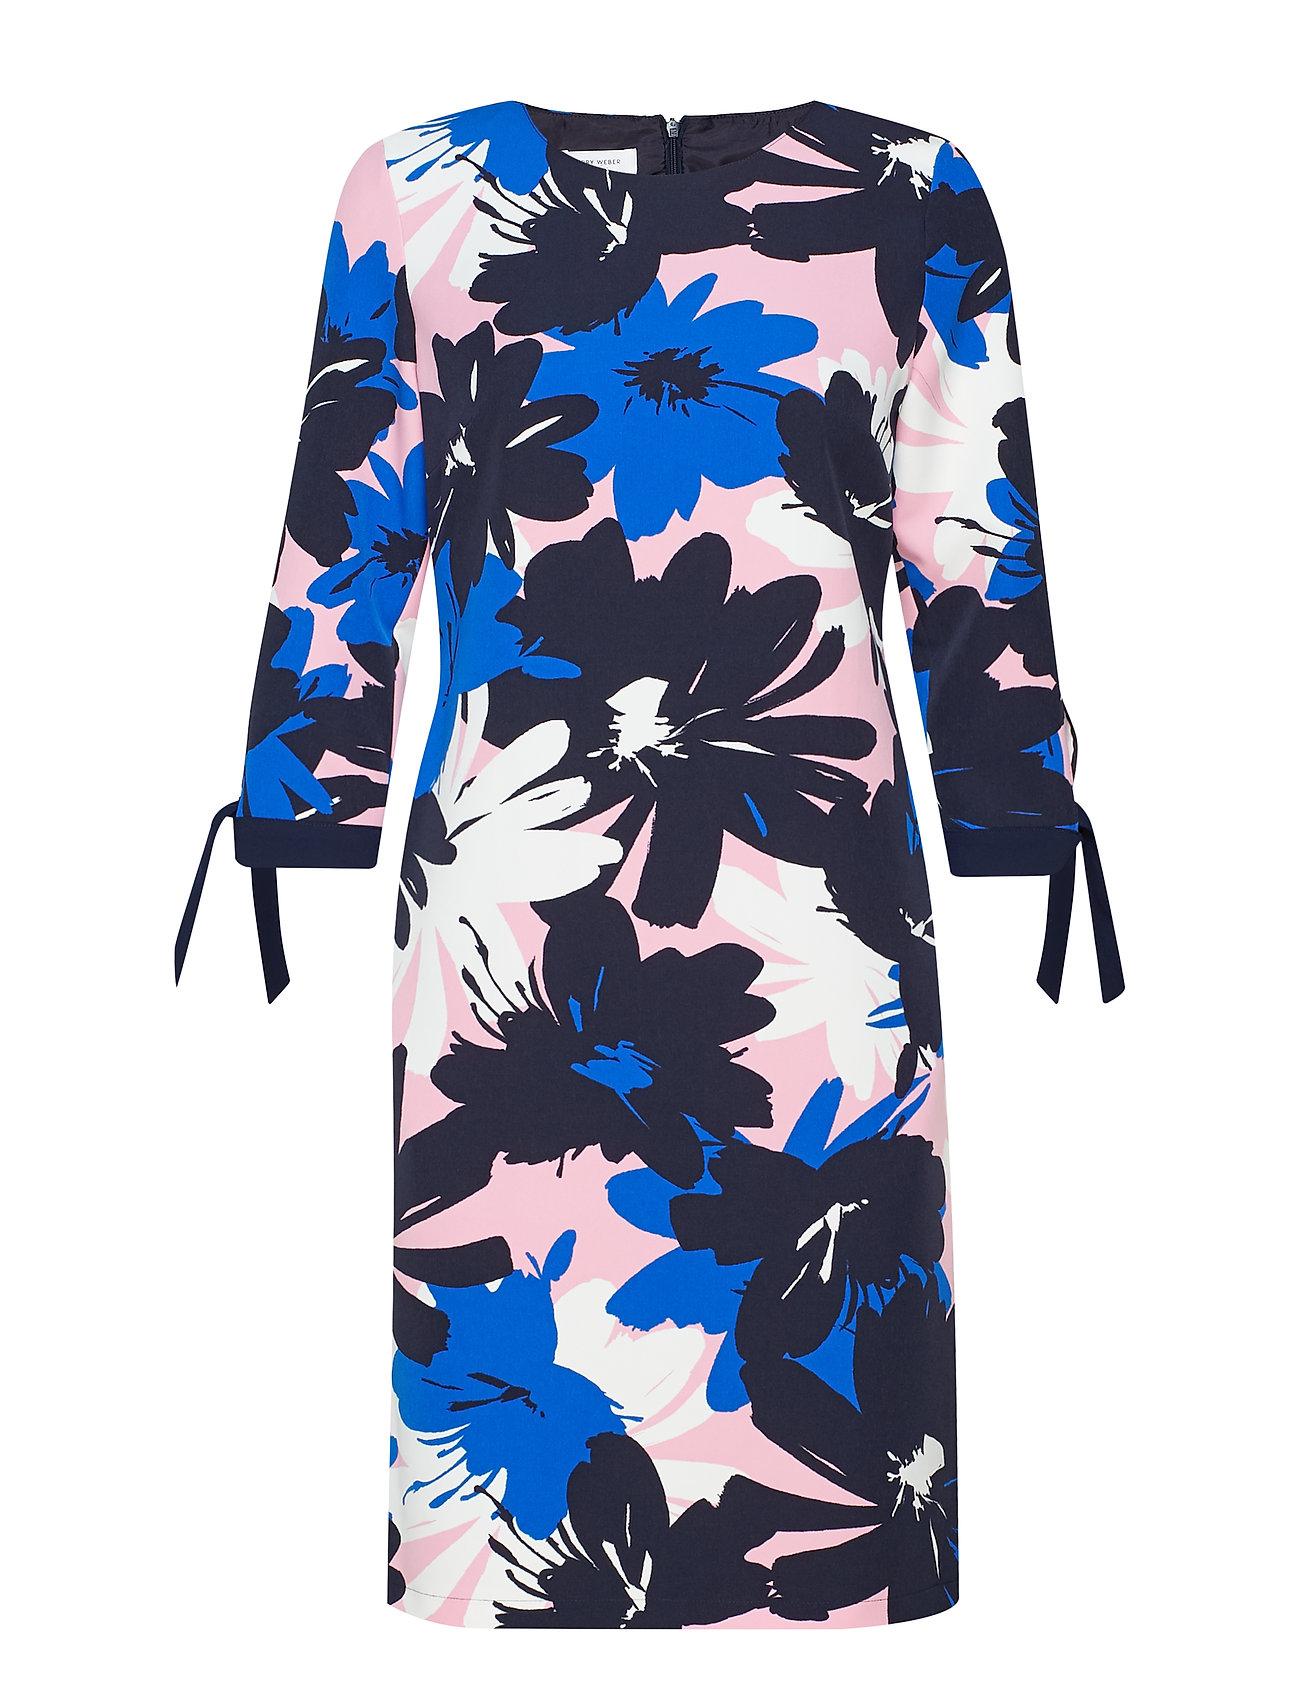 Gerry Weber DRESS WOVEN FABRIC - BLUE/ CANDY/ WHITE